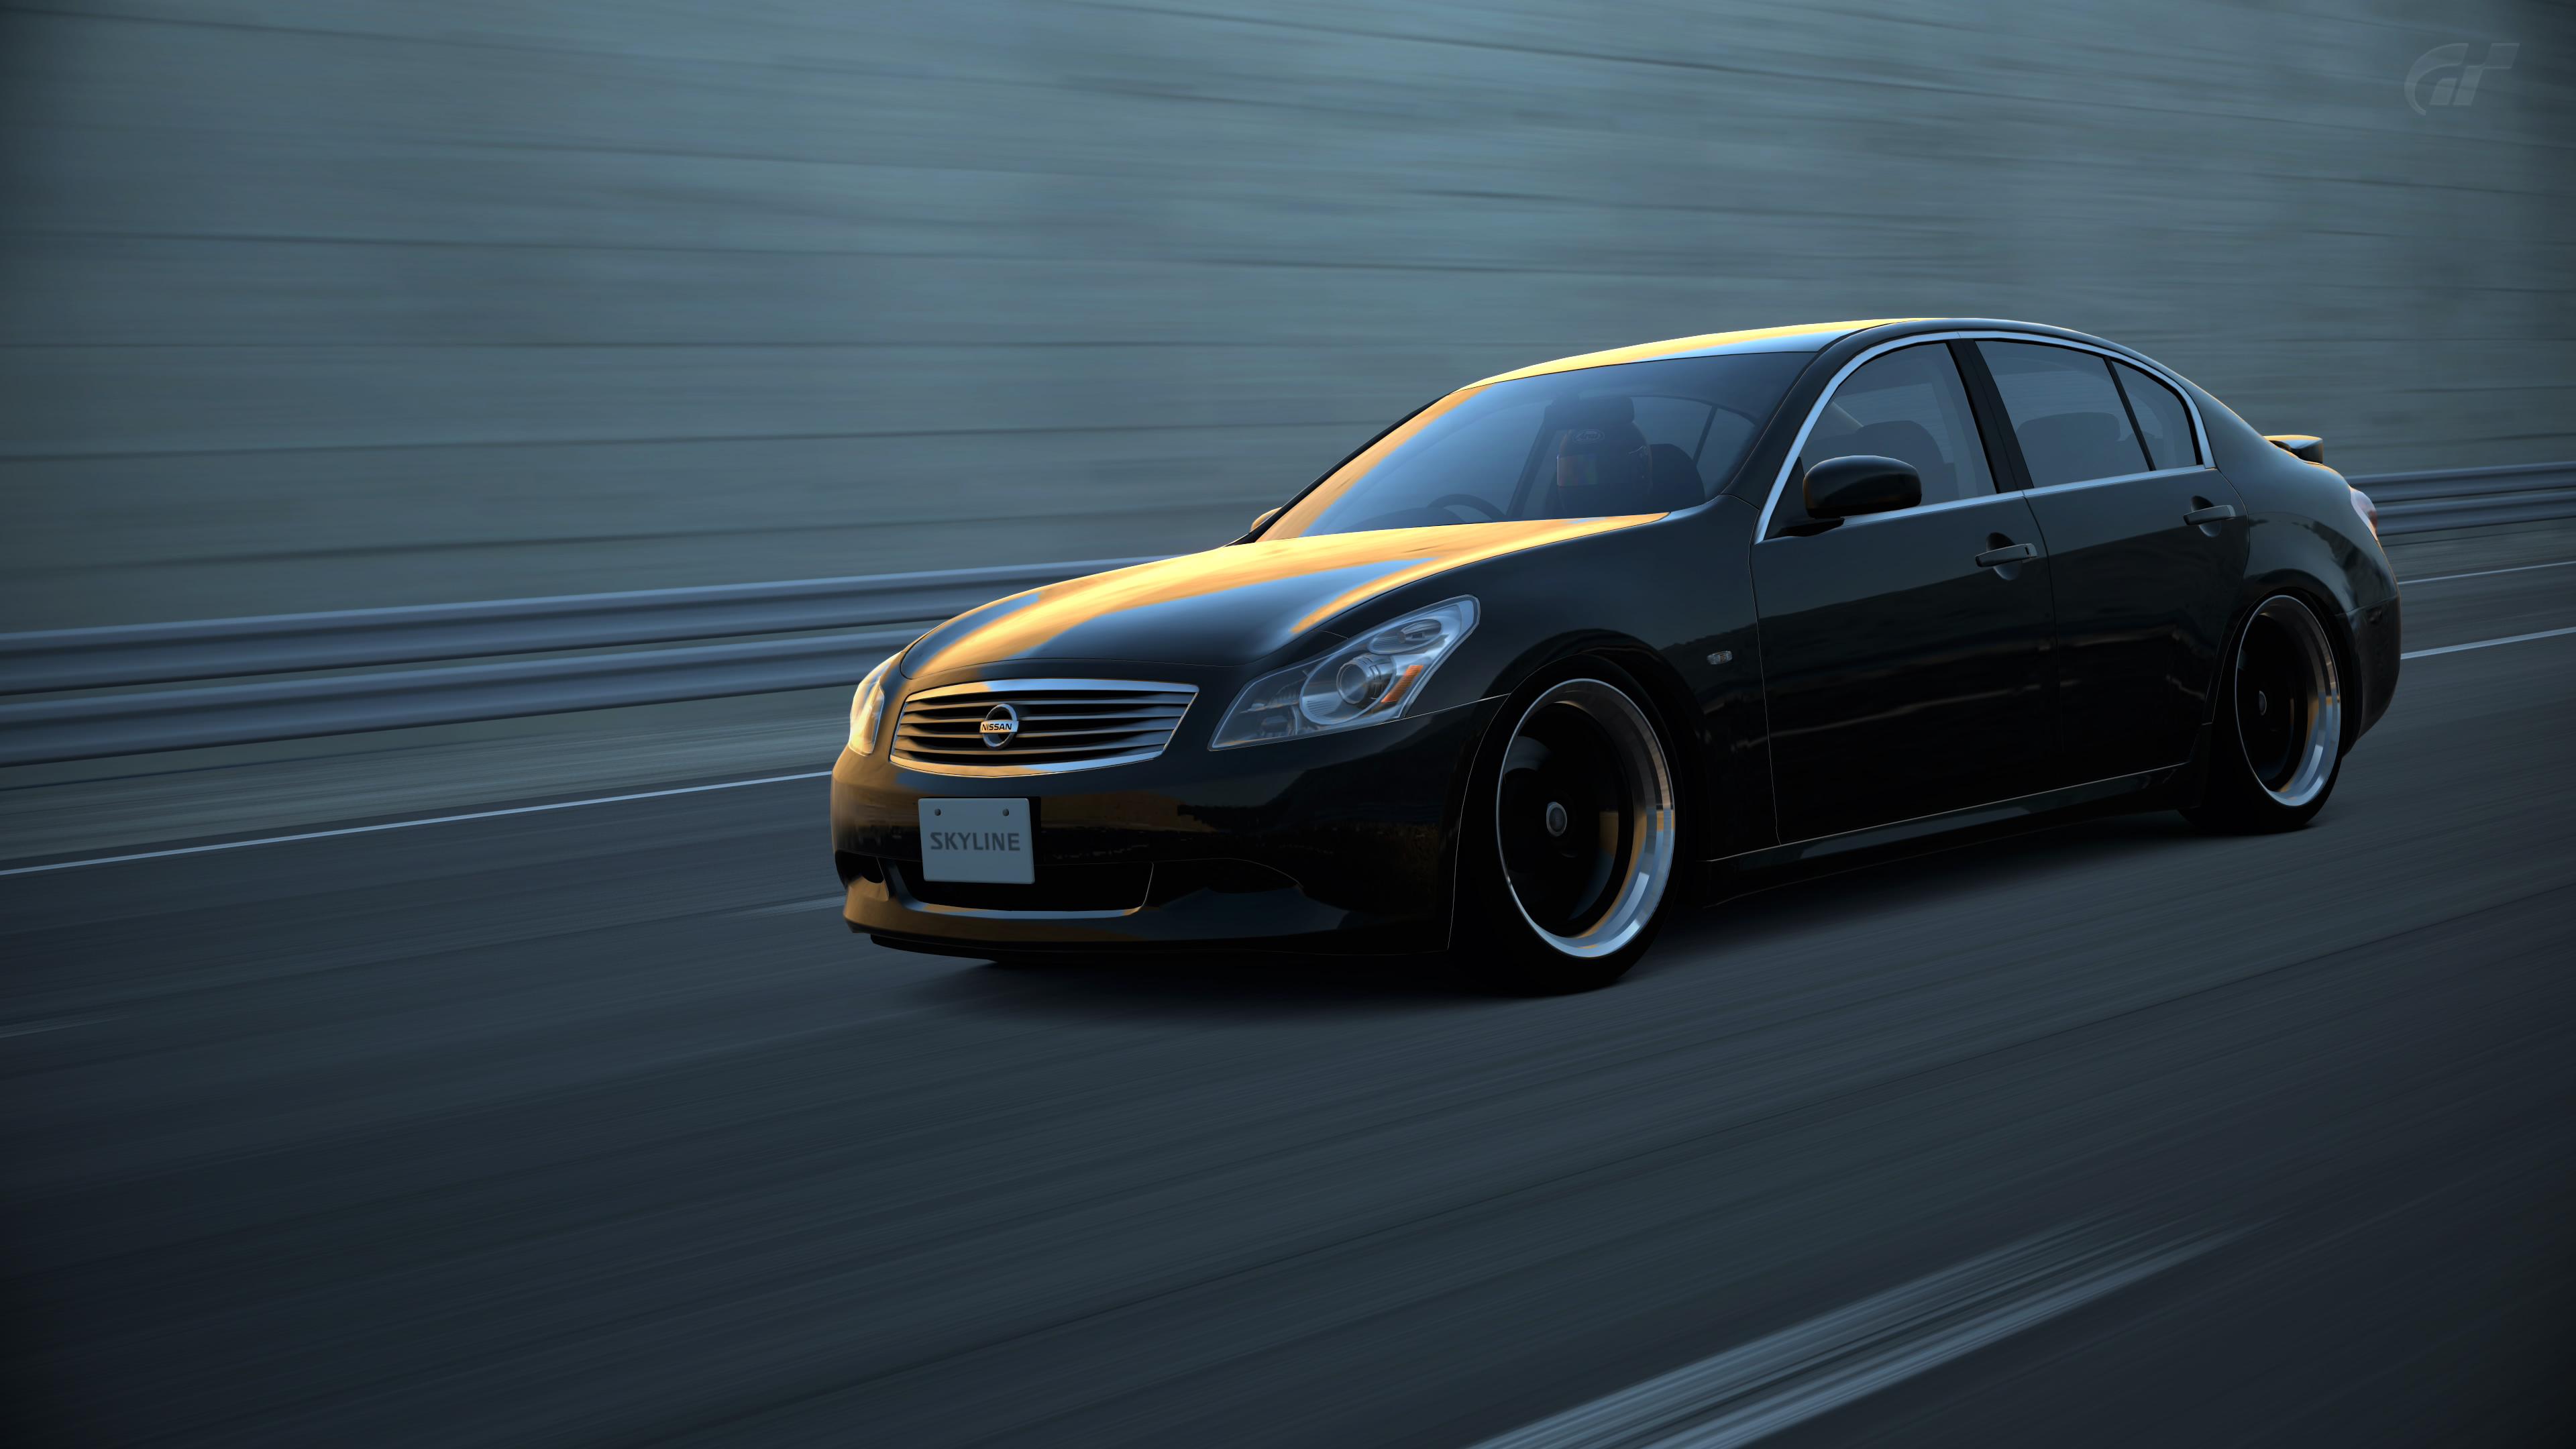 Nissan Skyline Sedan 350gt Type Sp Gt6 By Vertualissimo